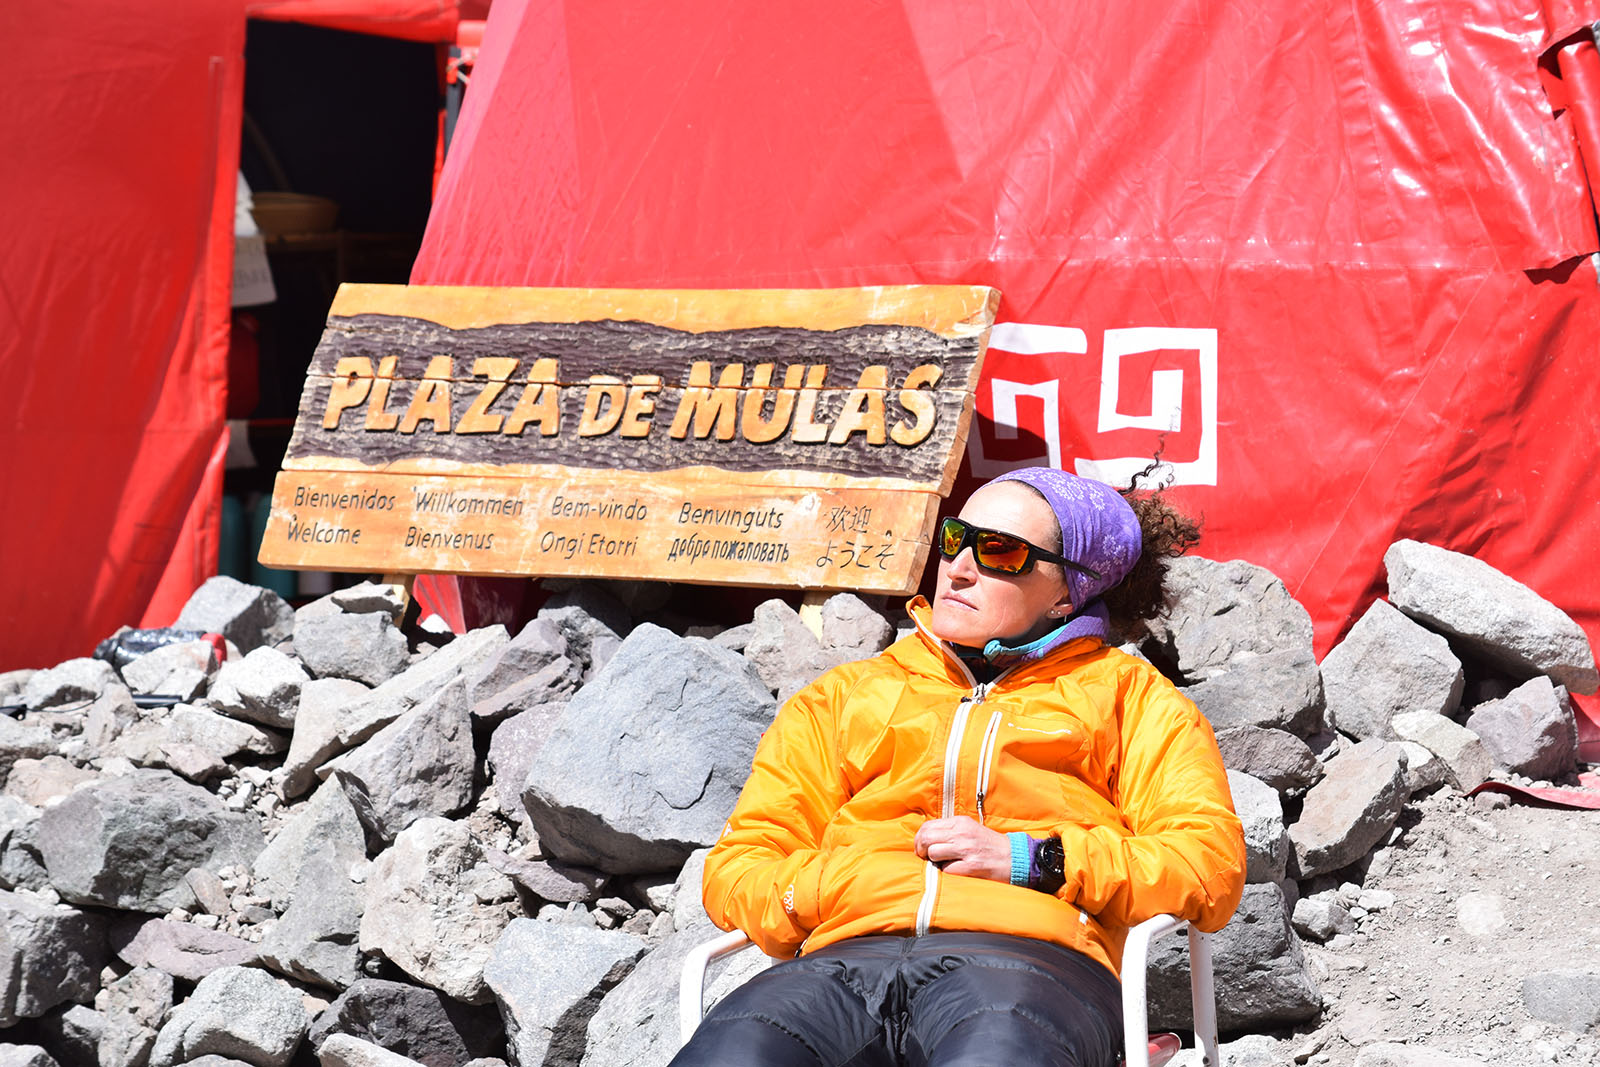 Resting in Plaza de Mulas